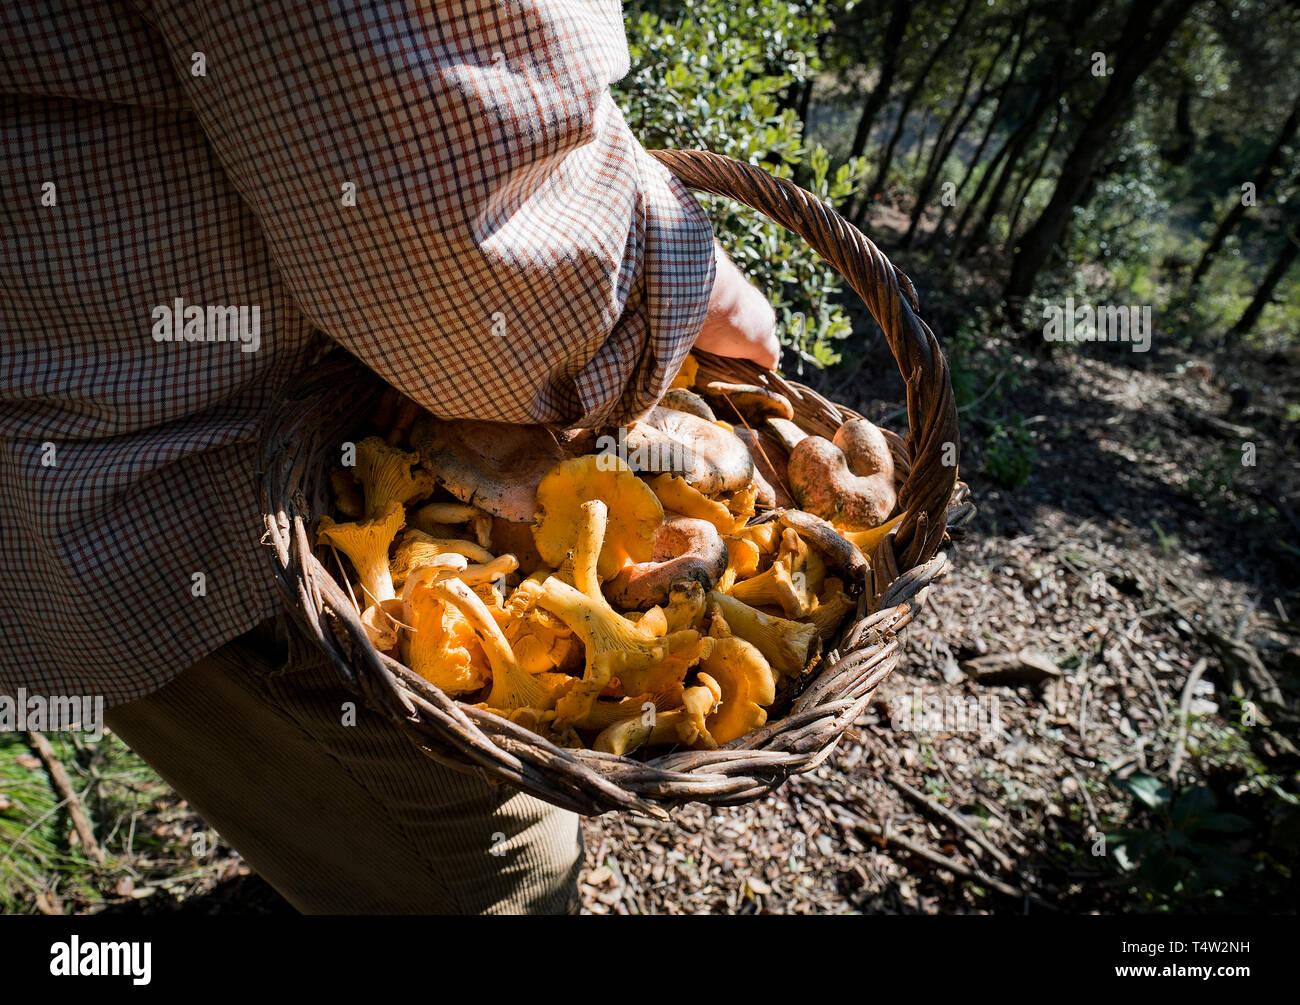 Bolataire, cueilleurs de champignons, Pineda de Mar. Catalunya. Spai Photo Stock